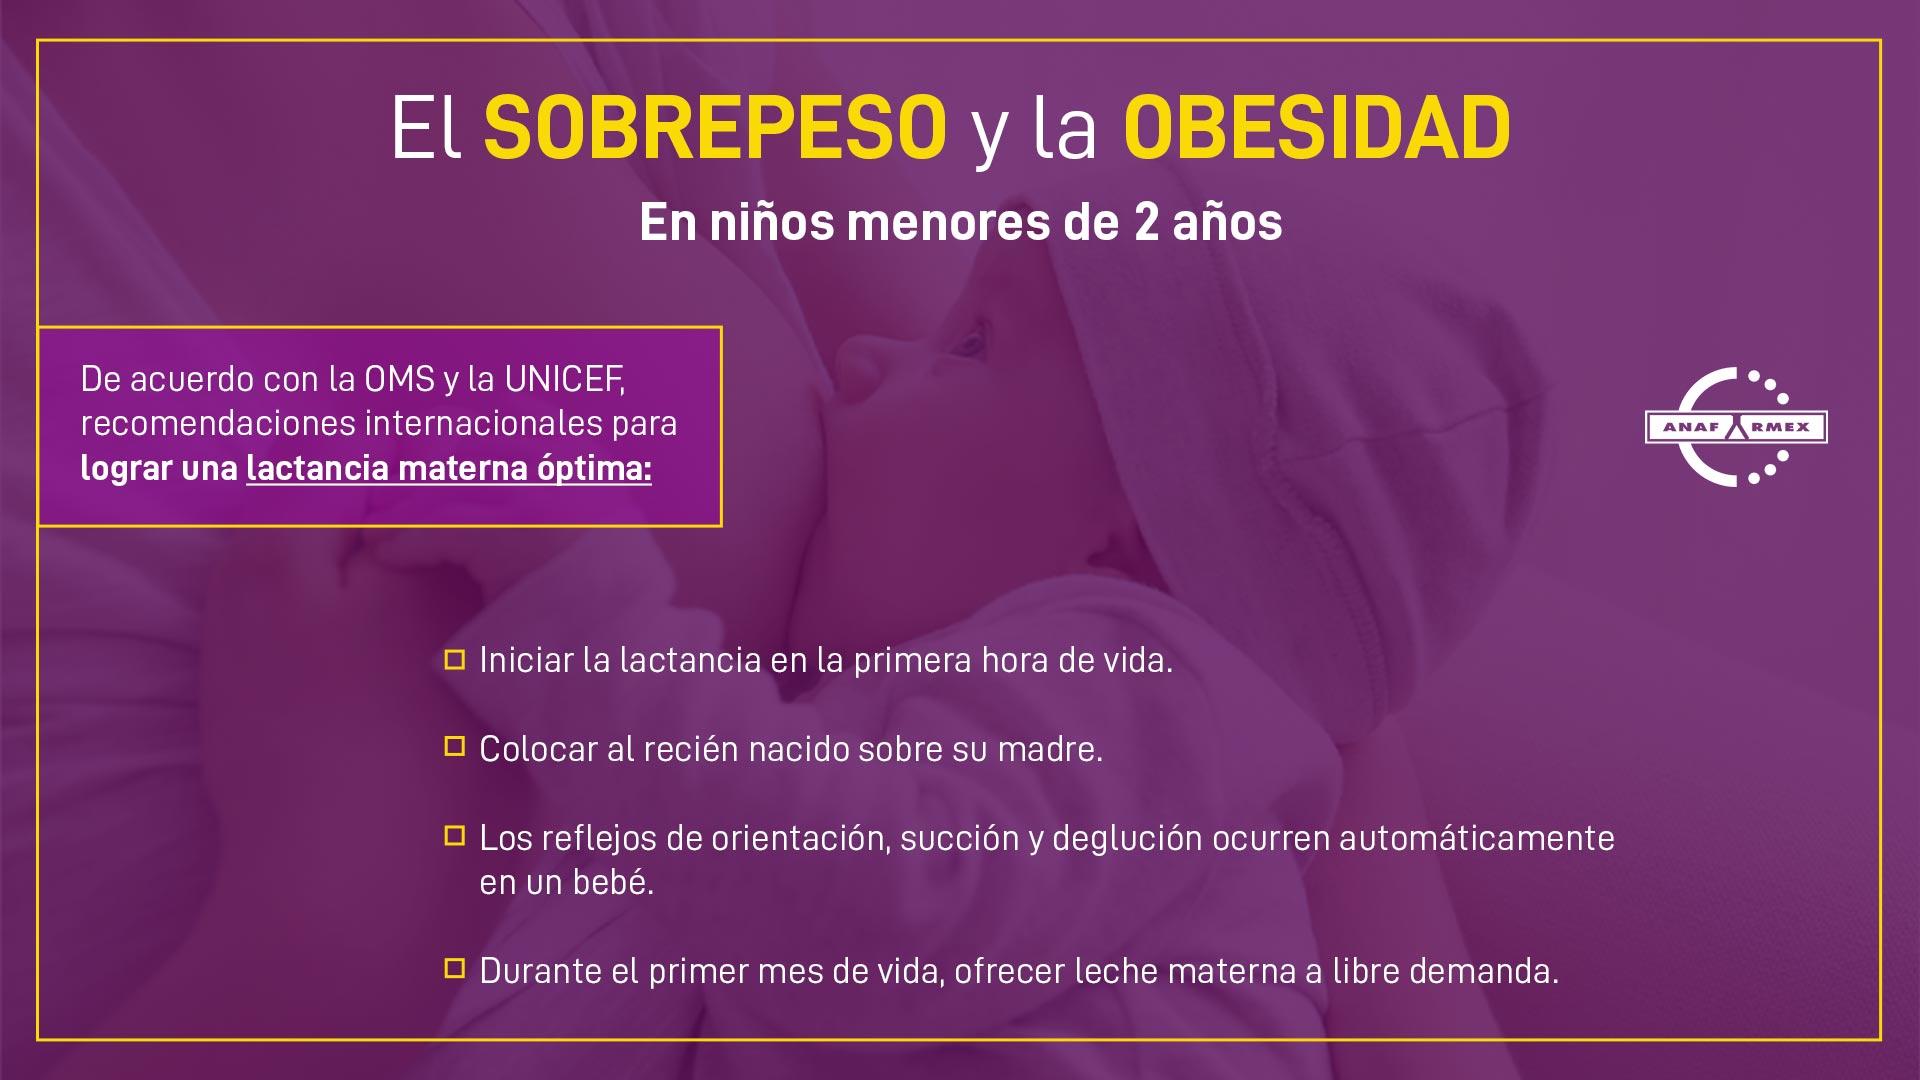 Recomendaciones internacionales para lograr una lactancia materna óptima.